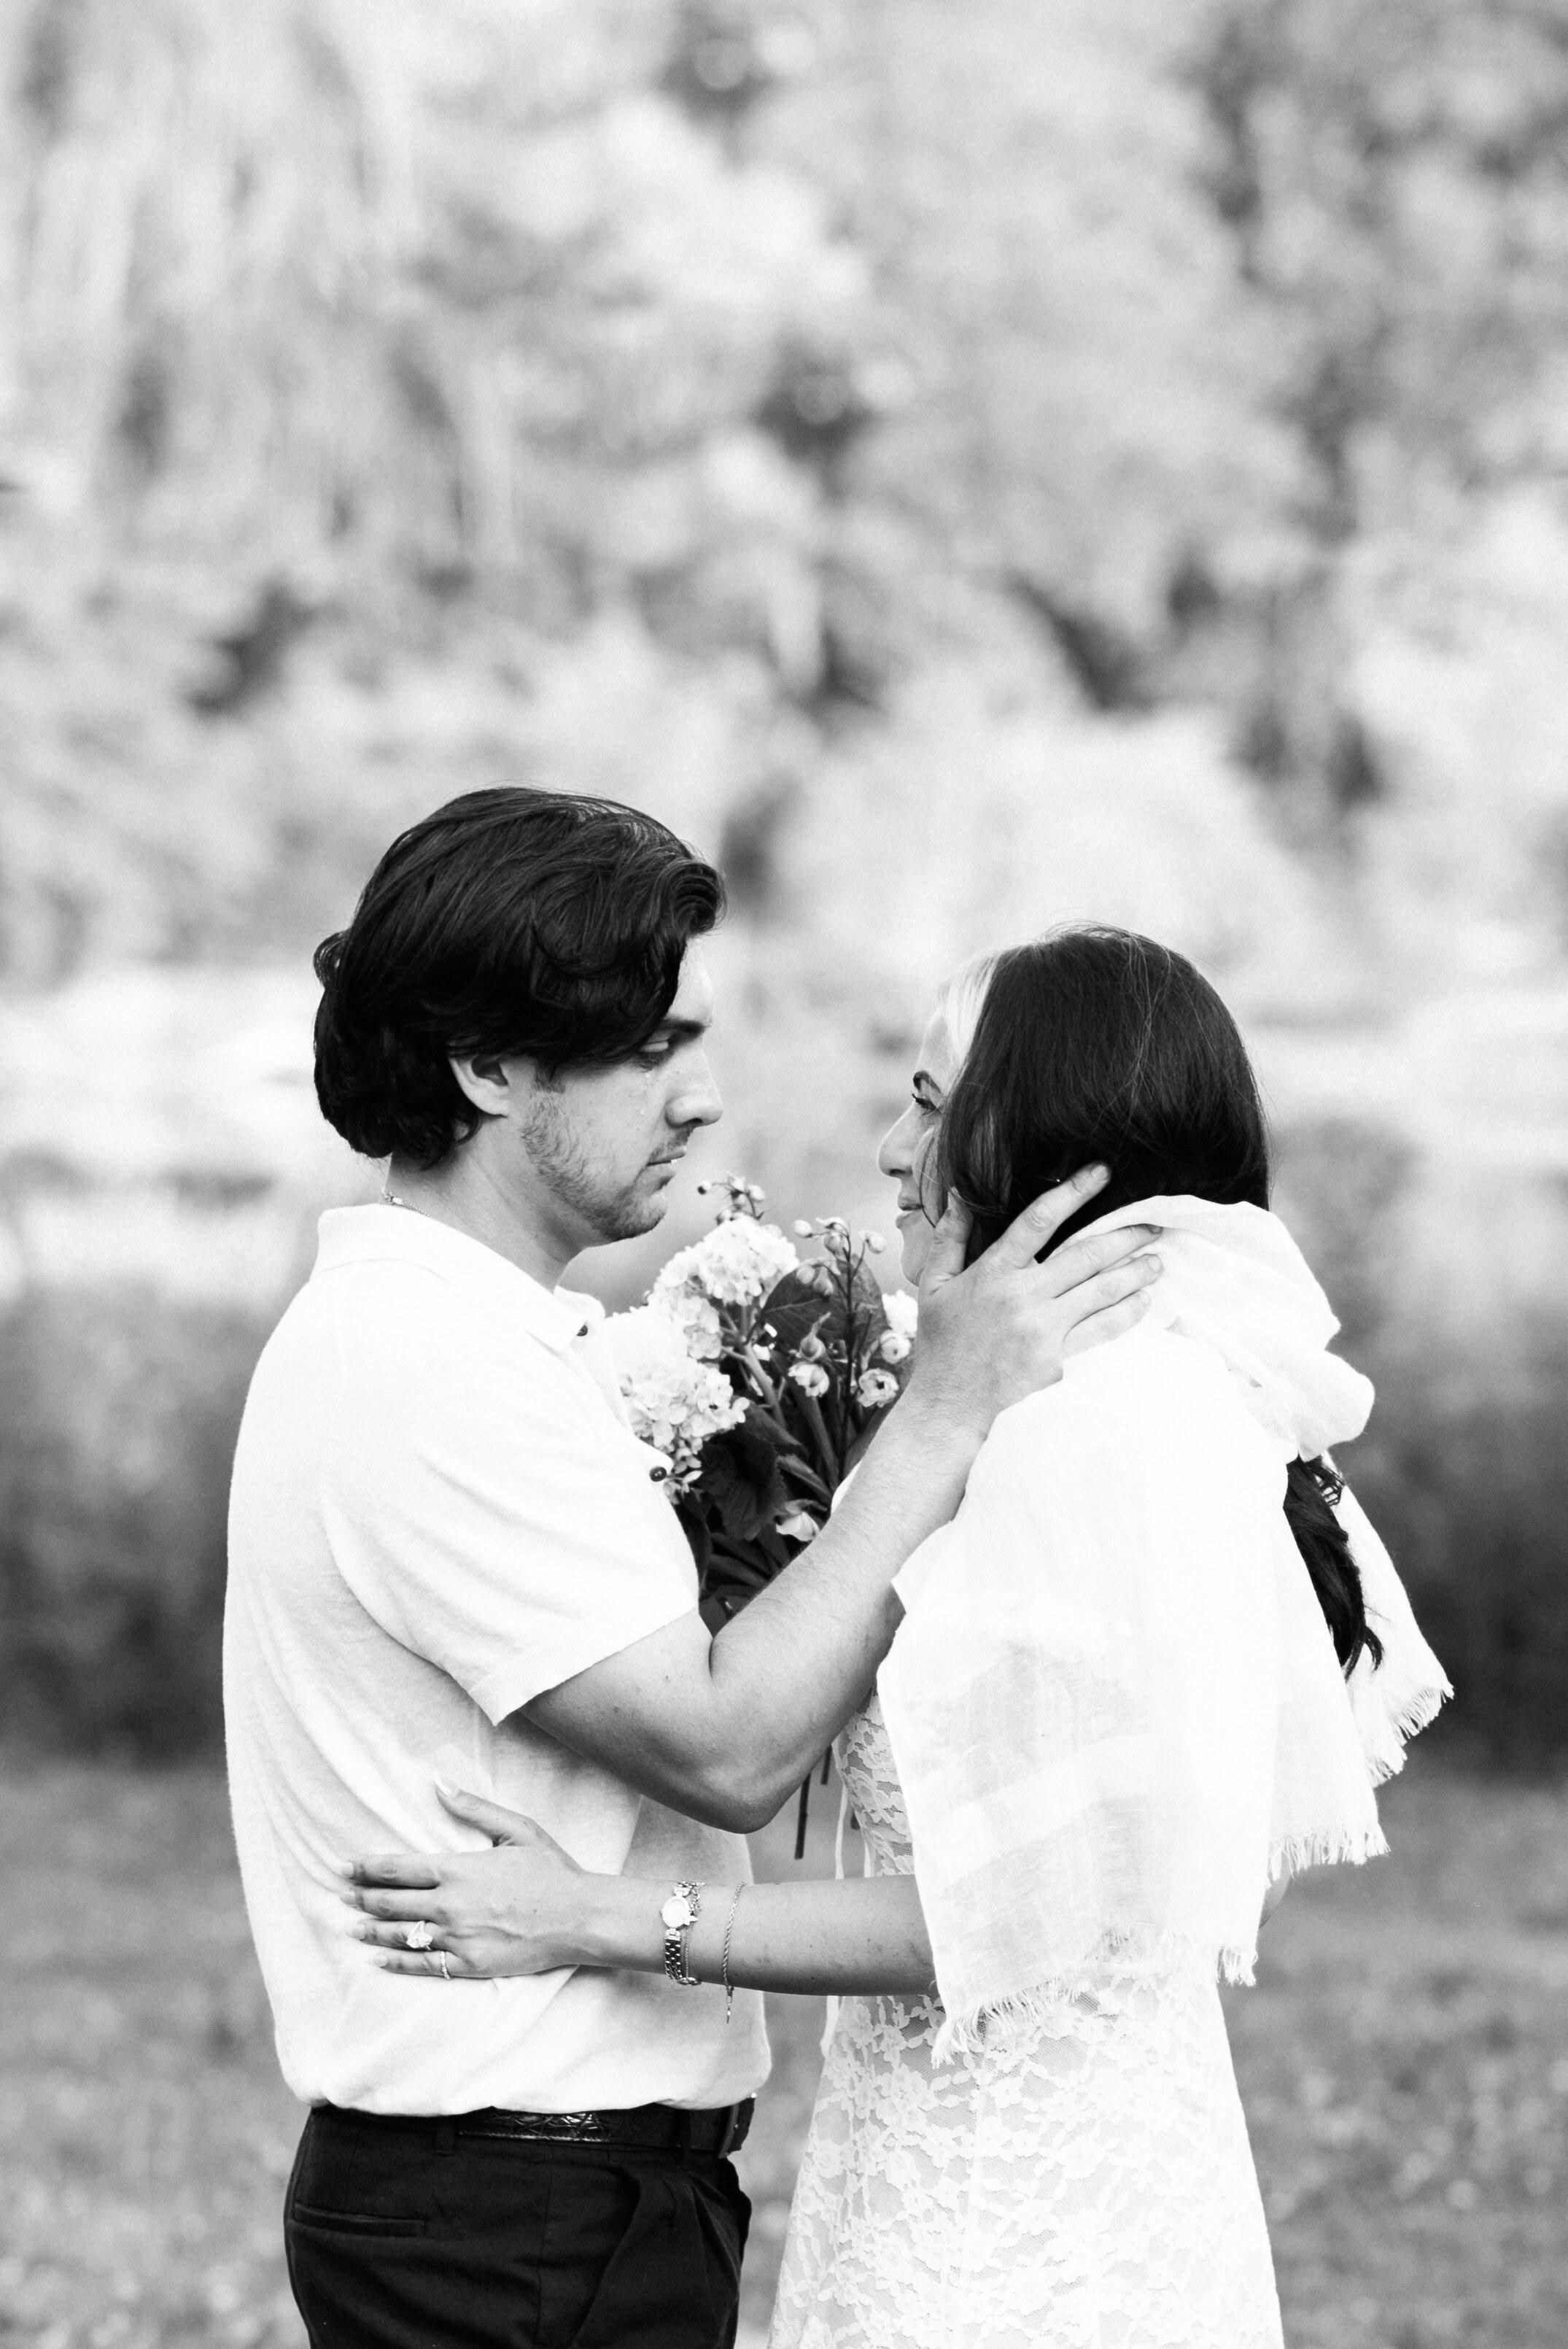 Emotional vow exchange between a wedding couple.